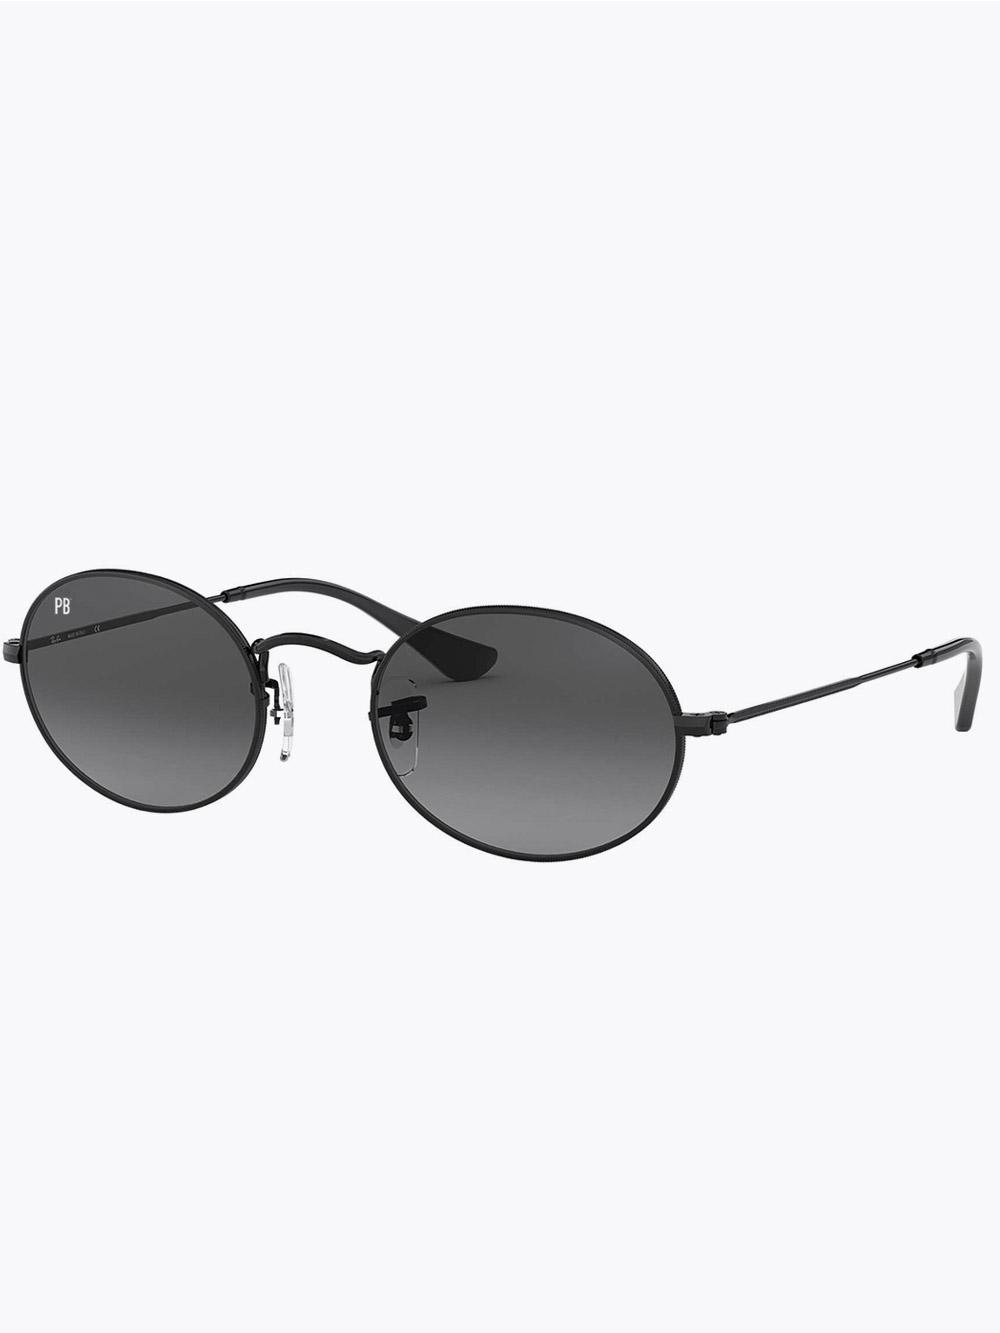 ovale-zonnebril-vintage-black-1